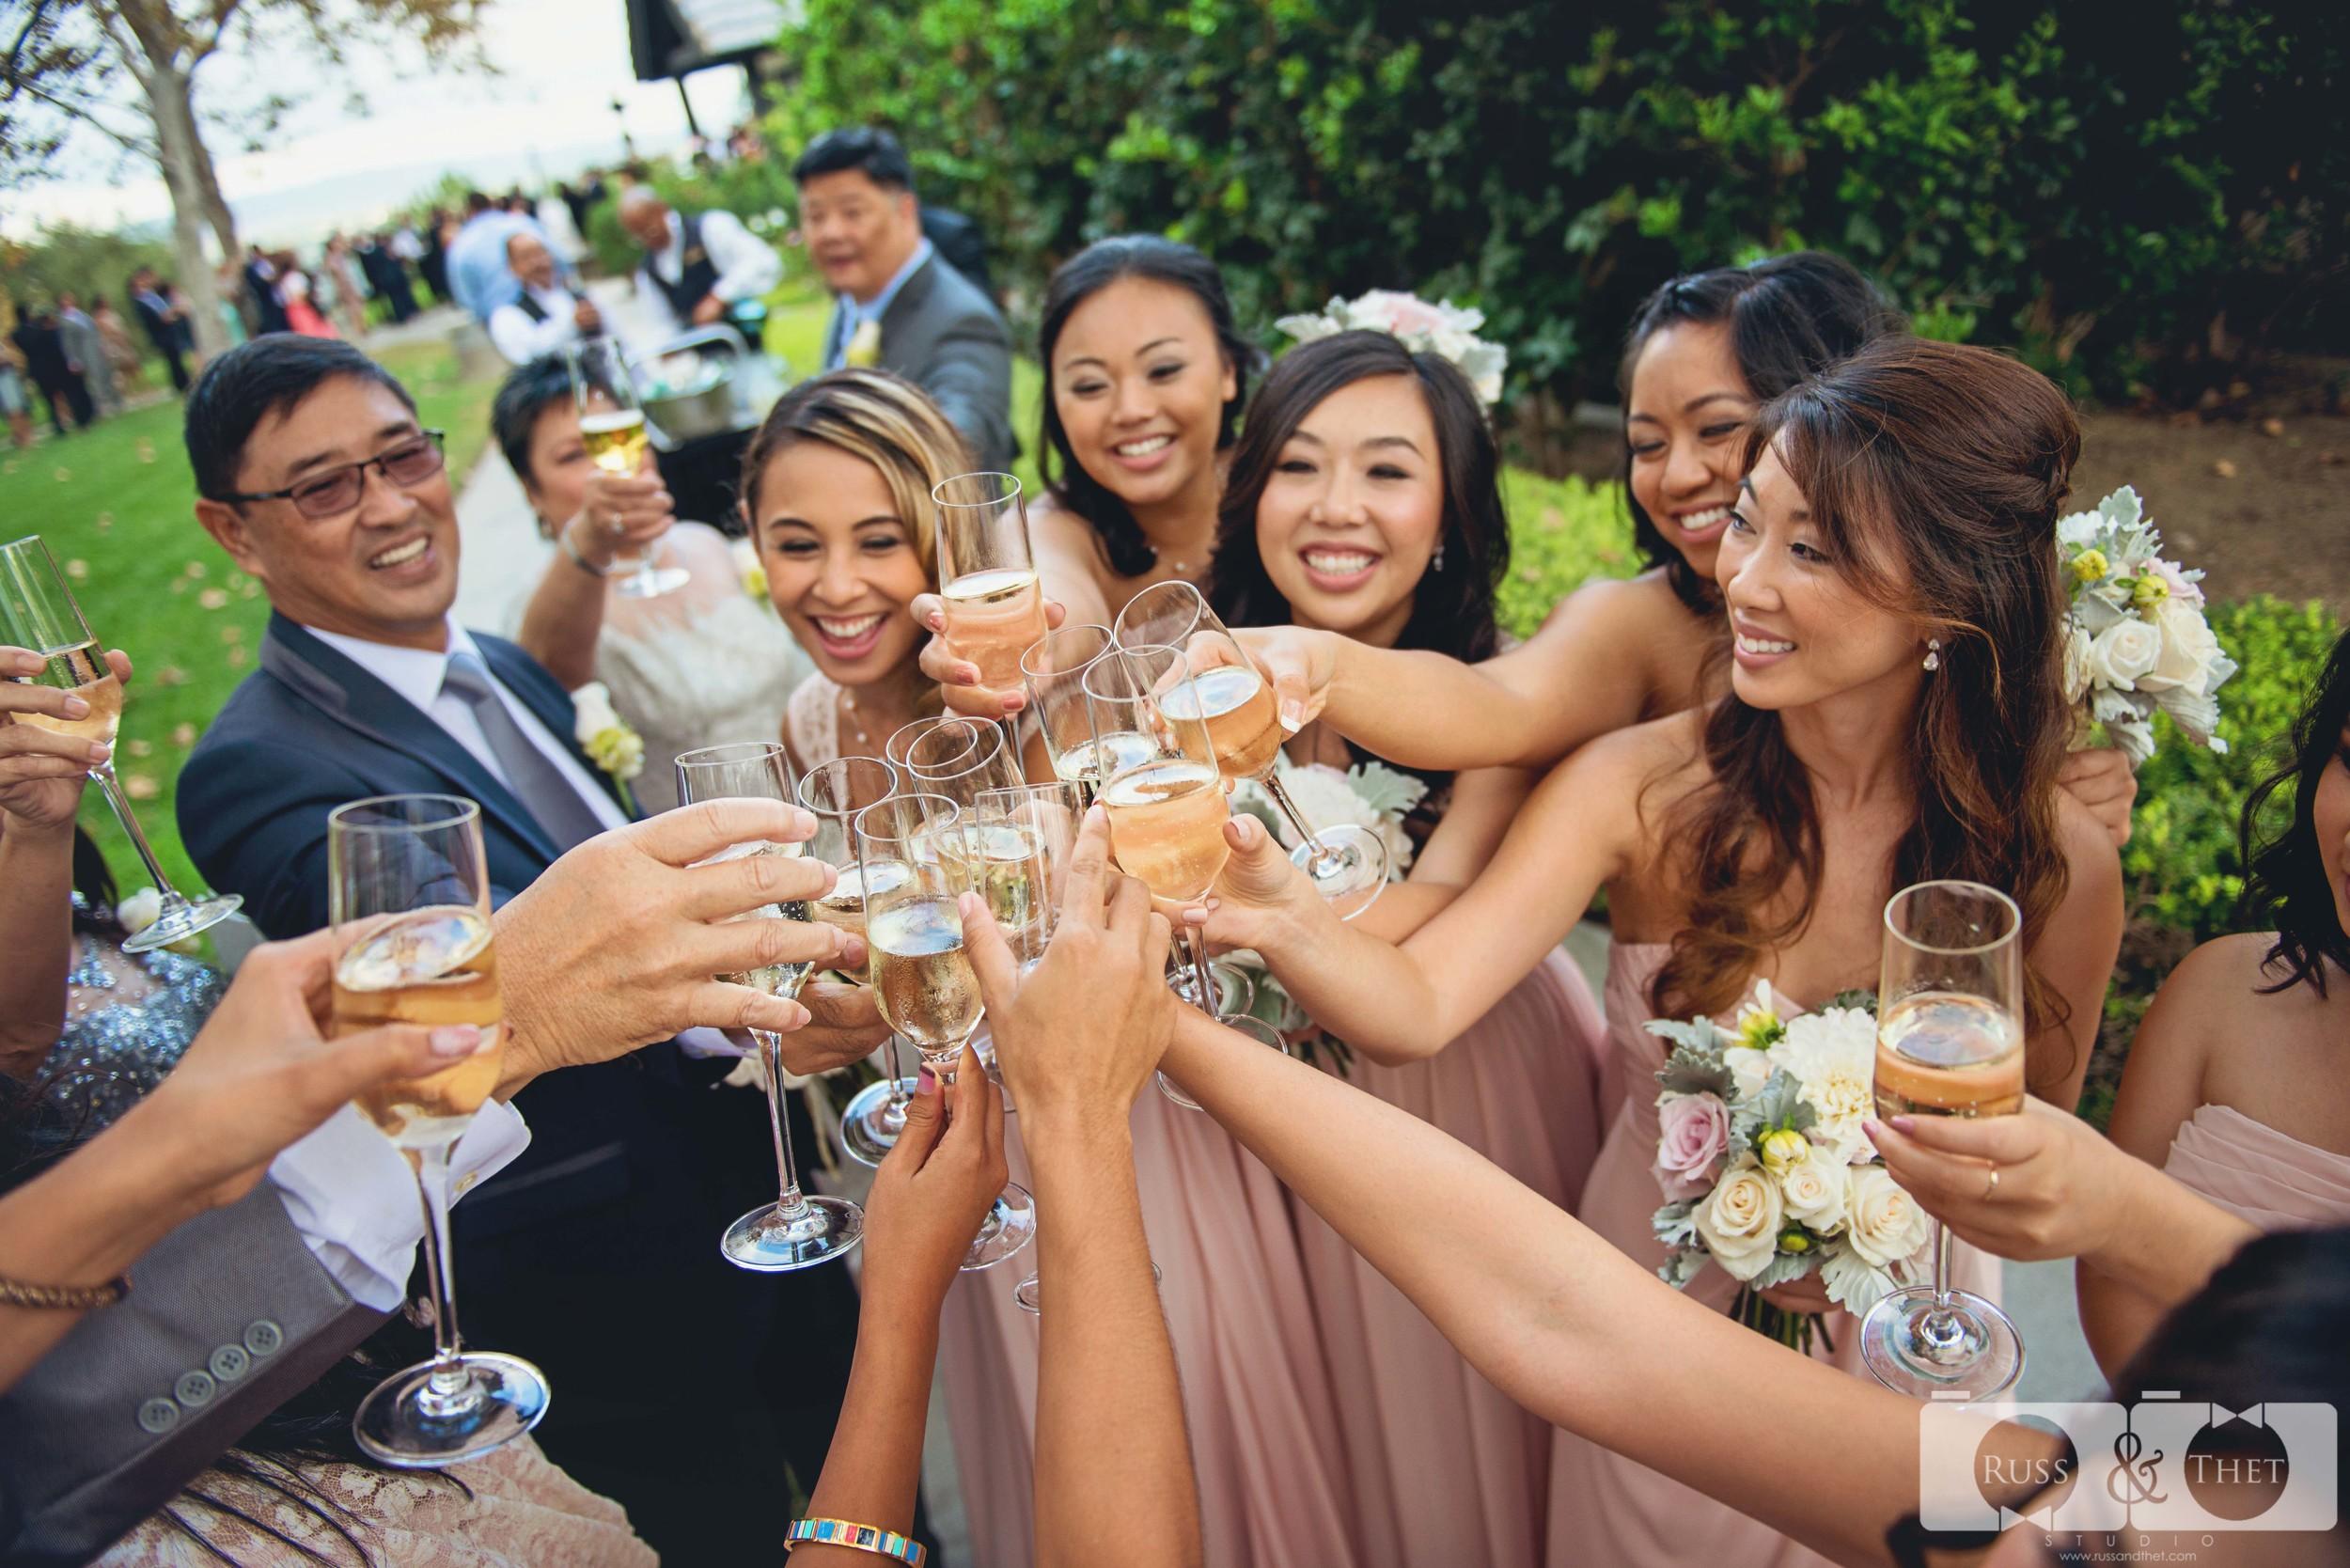 summit-house-fullerton-wedding-photographer-99.JPG